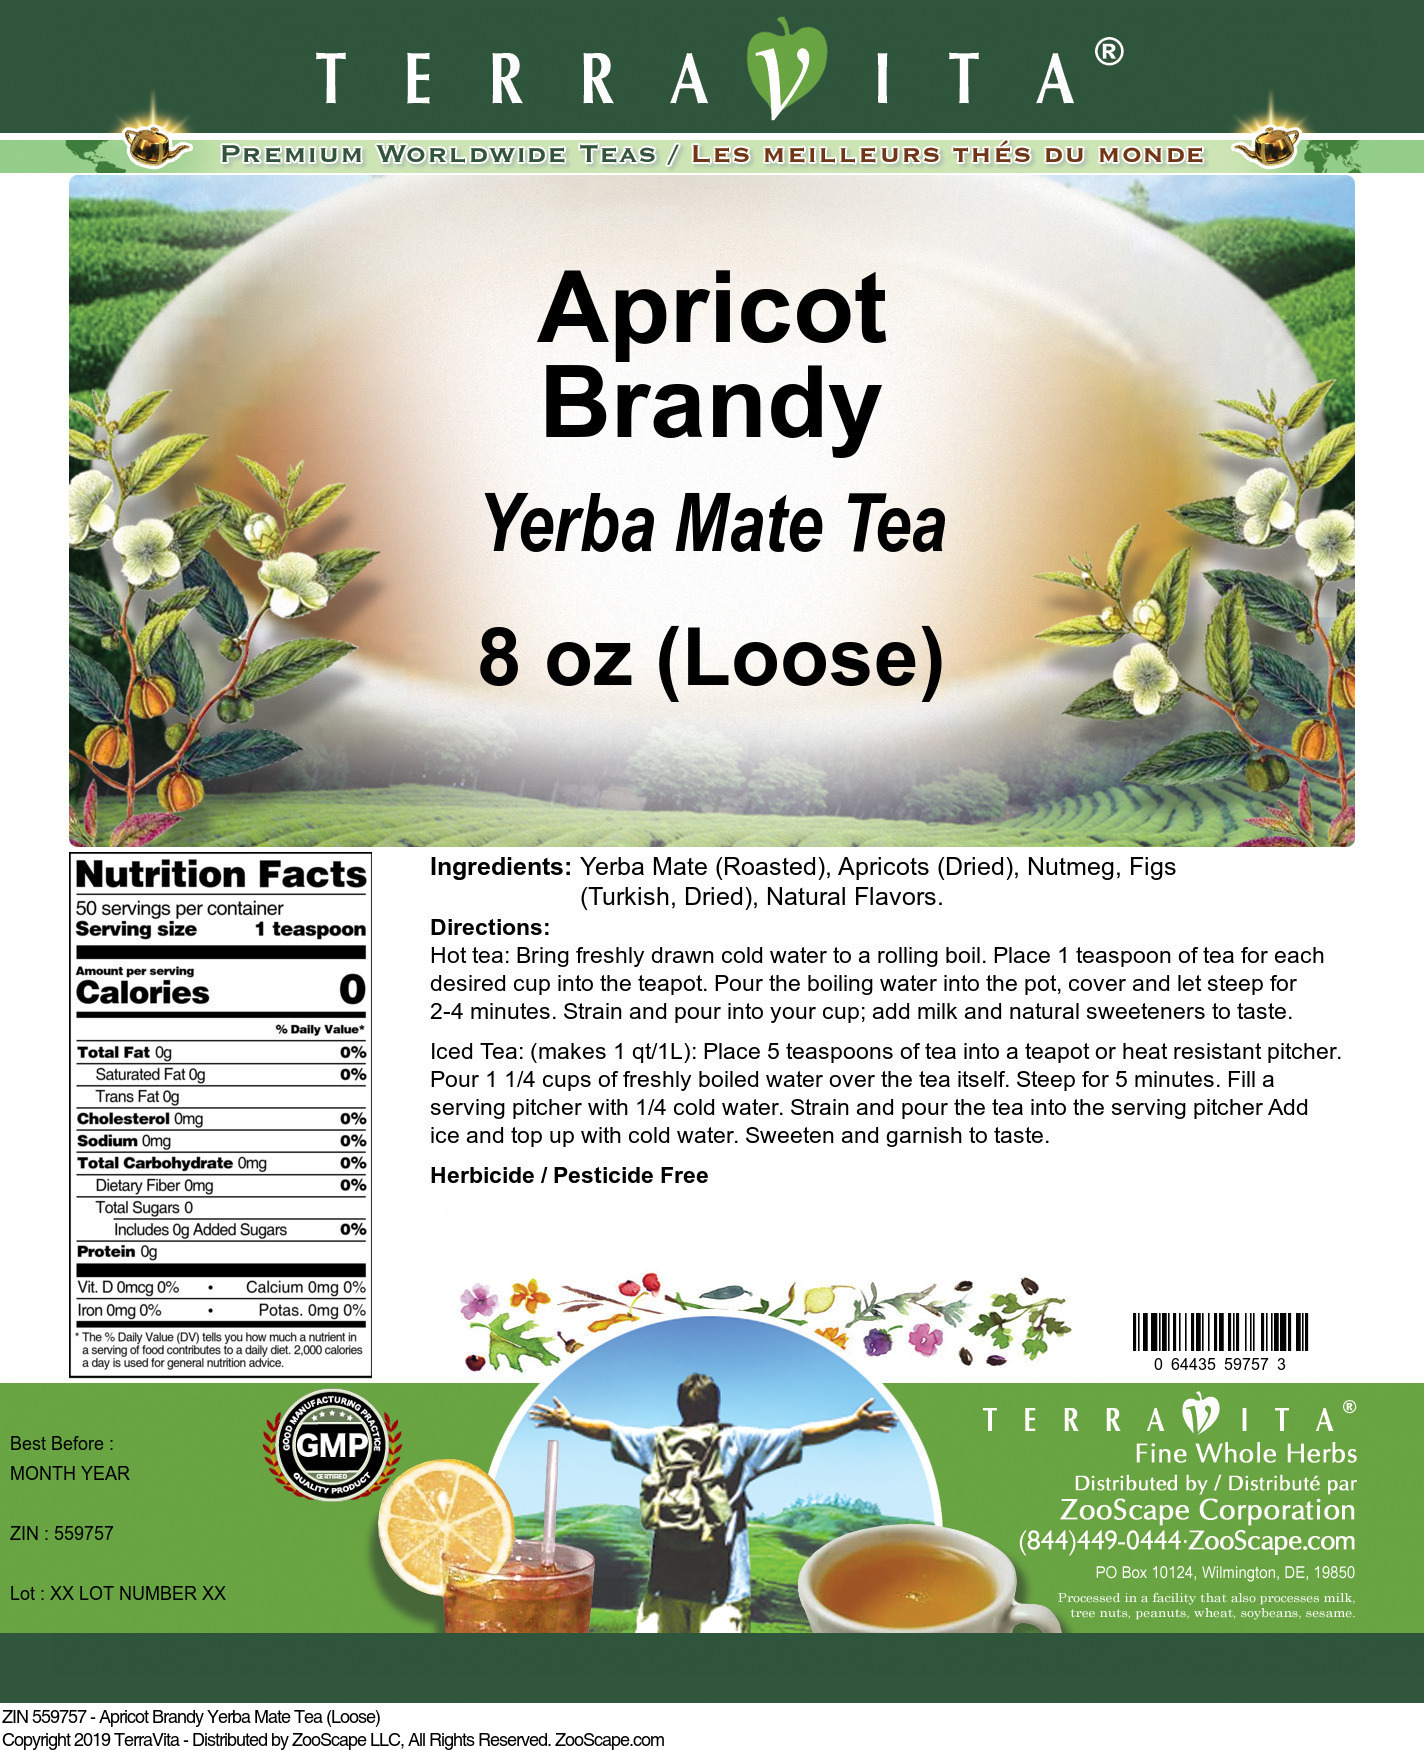 Apricot Brandy Yerba Mate